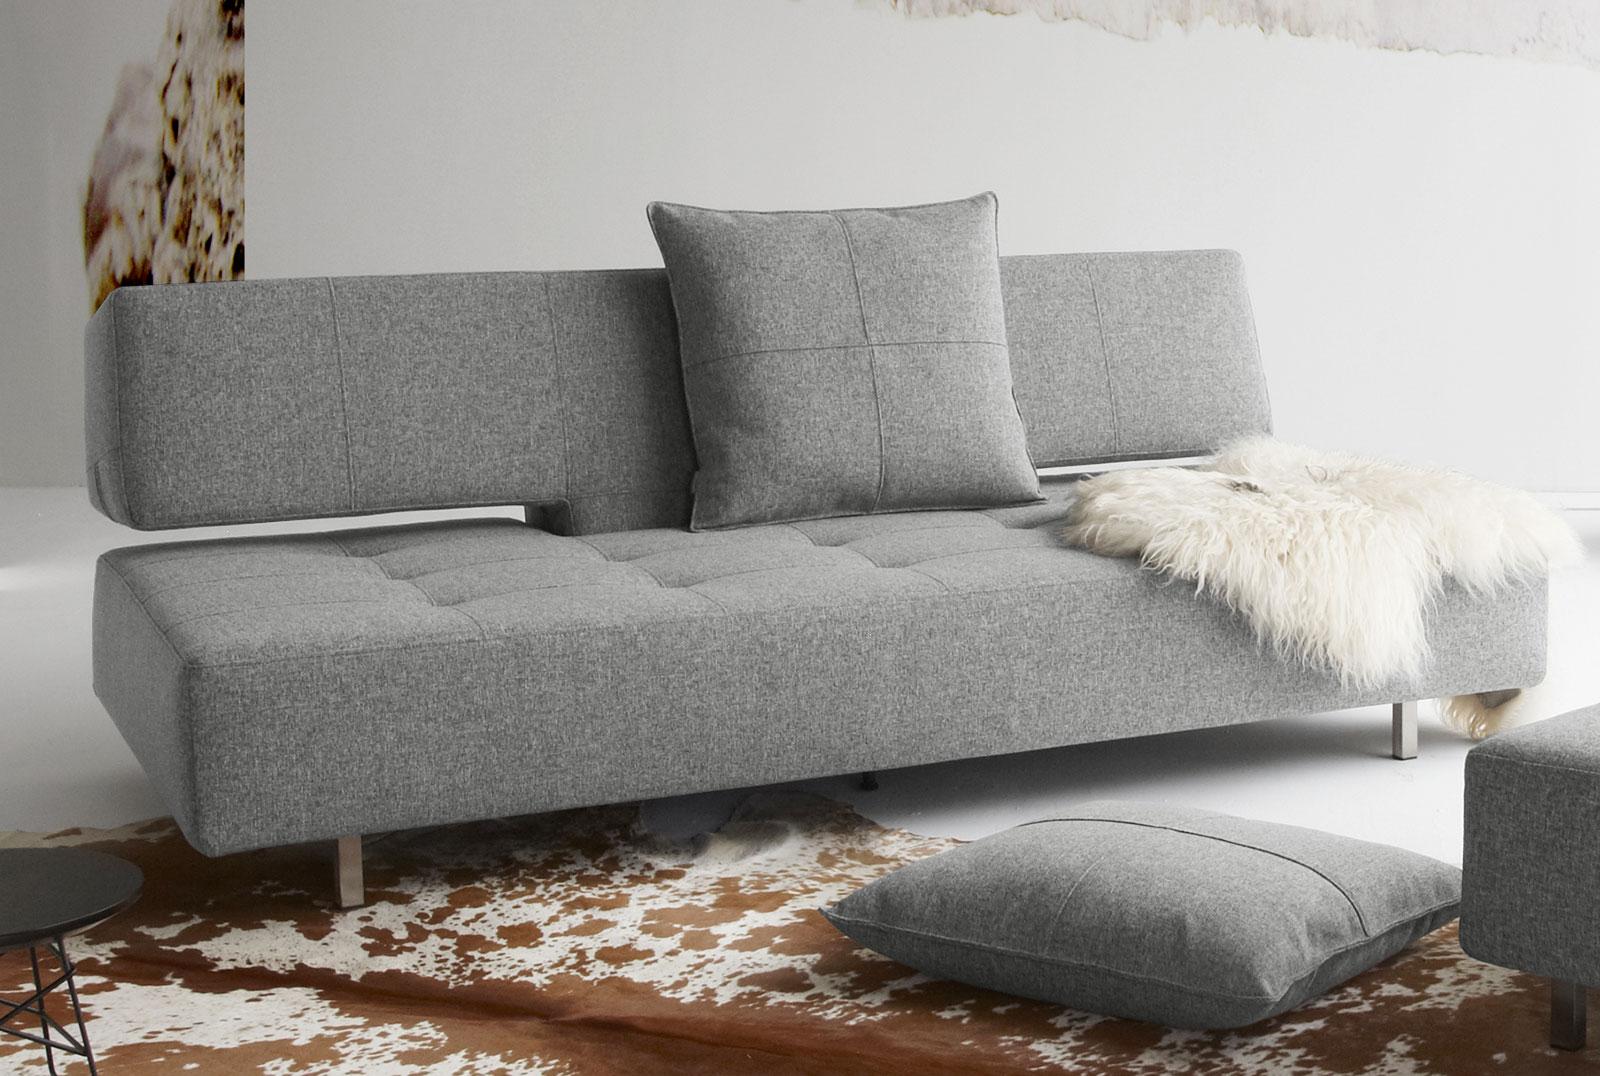 verstellbares schlafsofa mit sitztiefe ber 70 cm ross. Black Bedroom Furniture Sets. Home Design Ideas